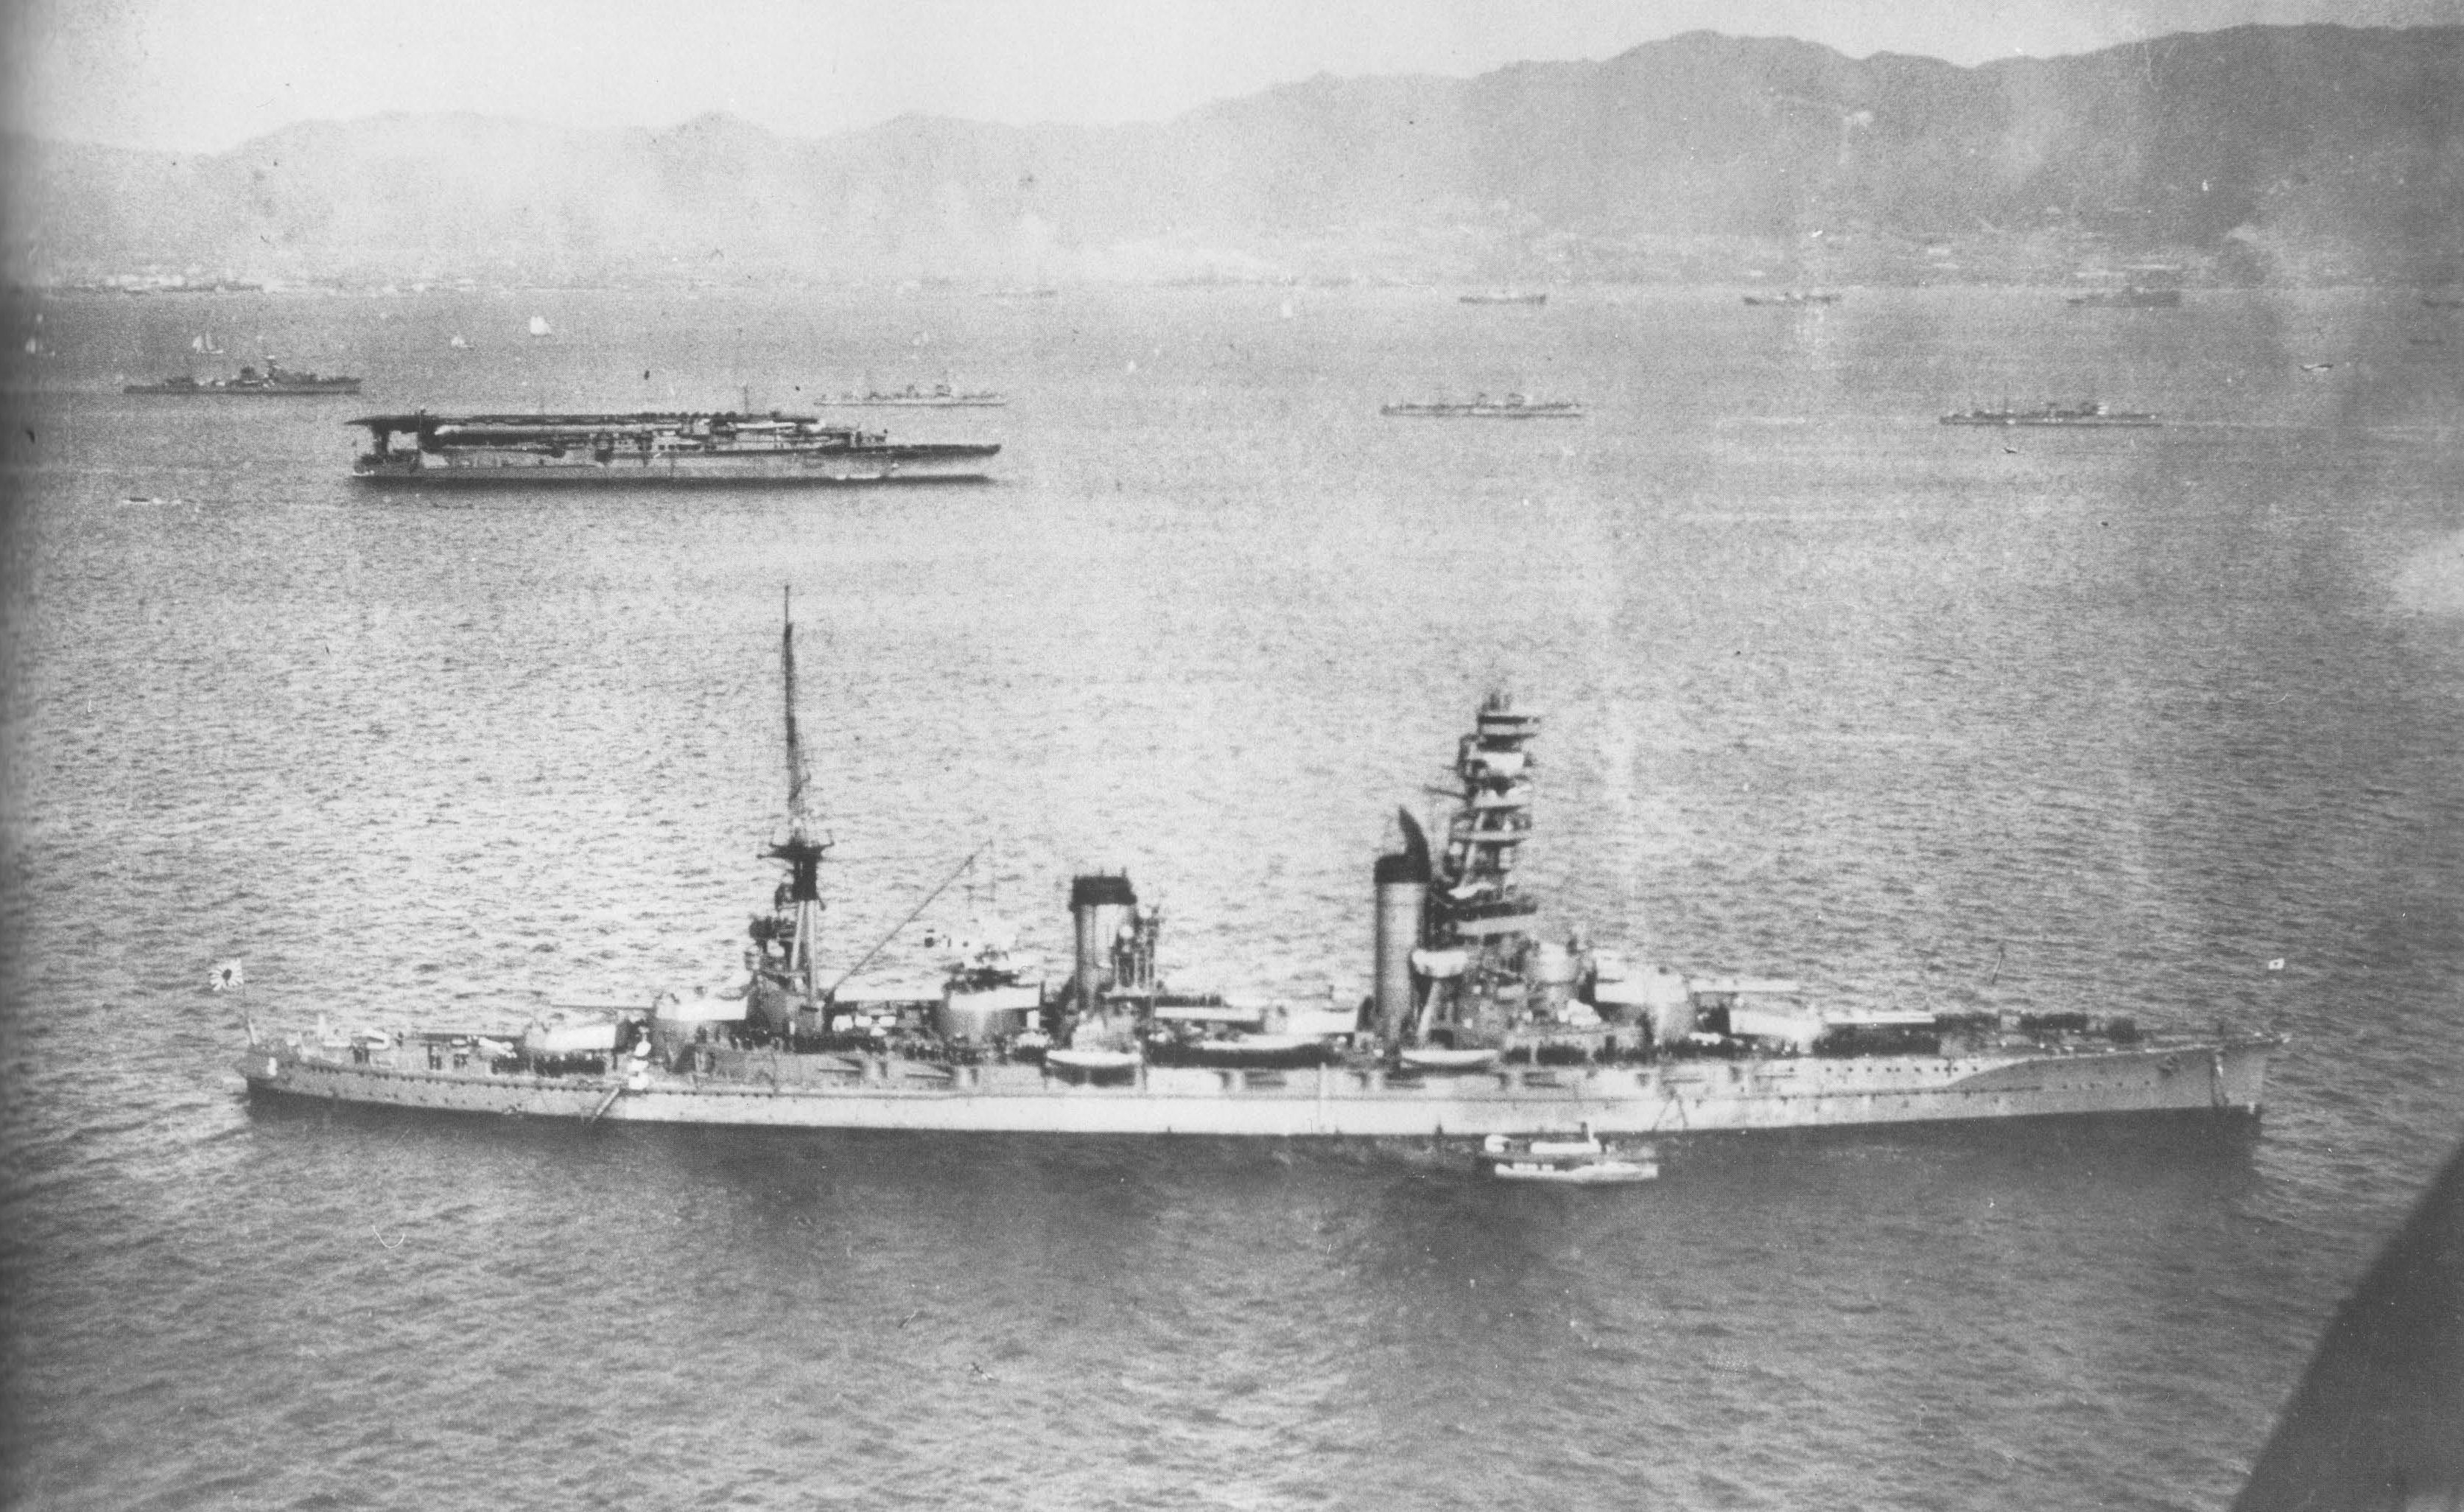 Japanese battleship in the sea, 1930s 93